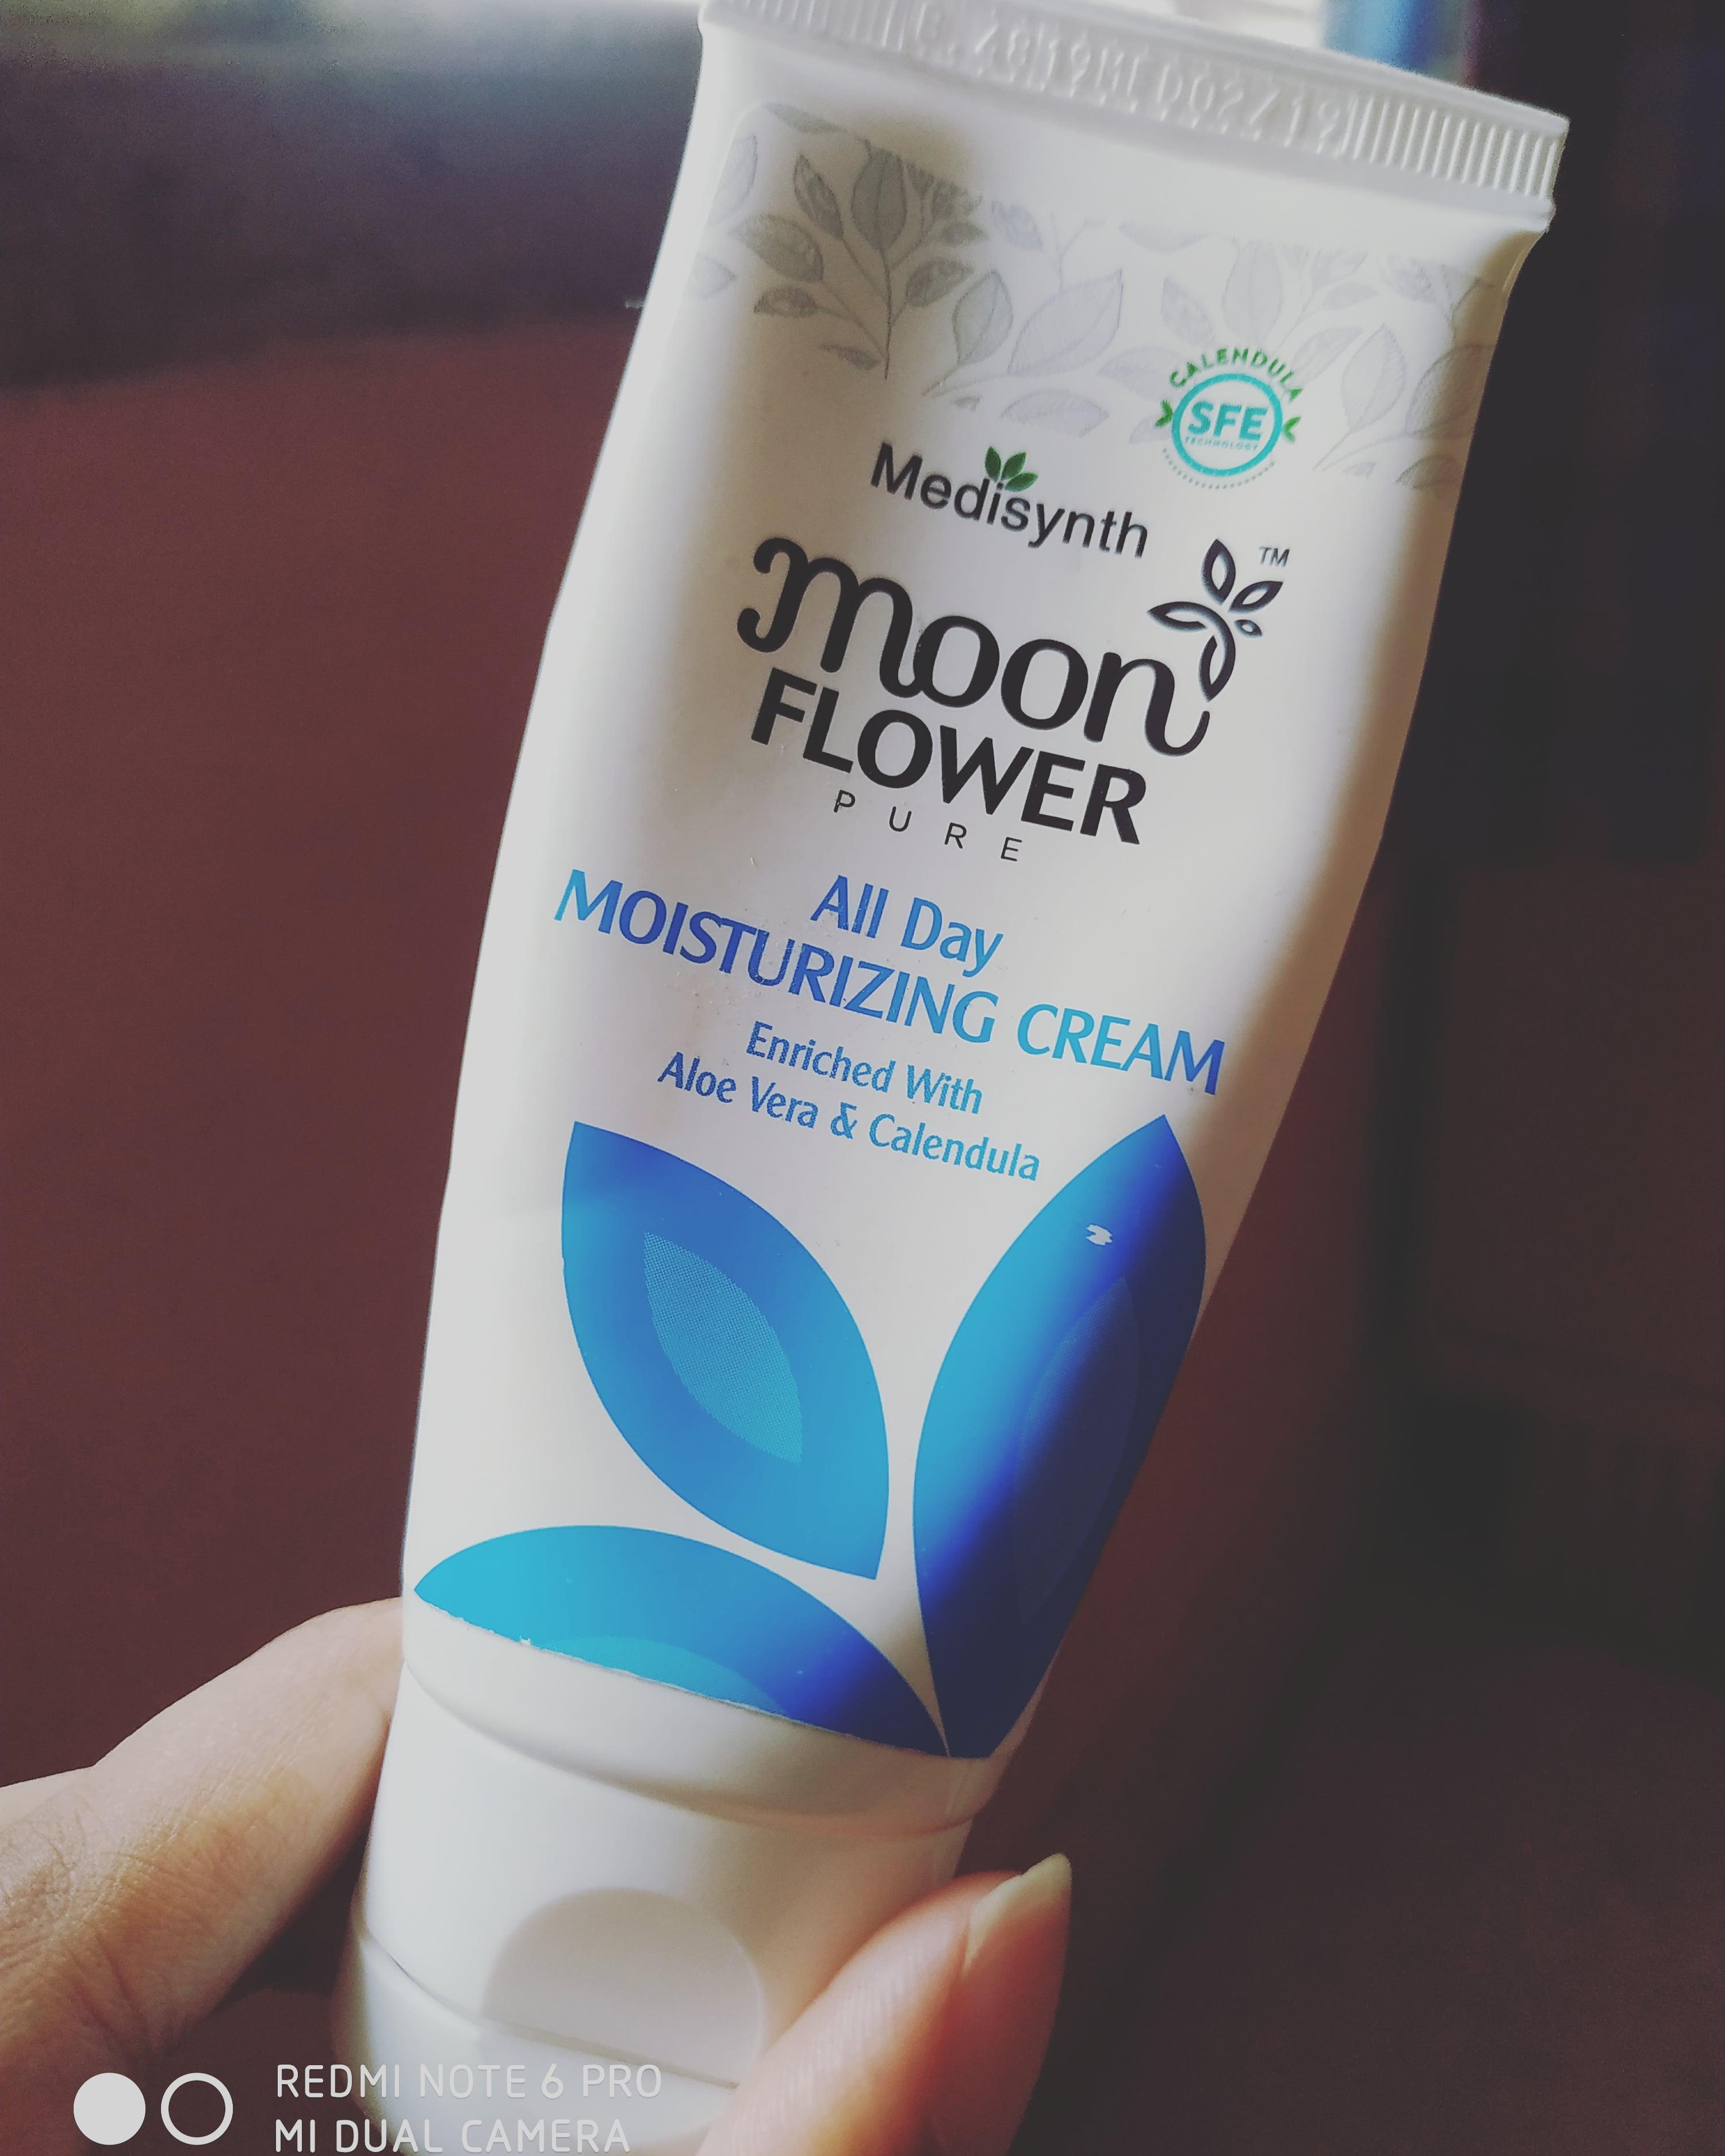 Moonflower All day Moisturizing Cream -Recommended Moisturizing Cream-By anisha_dolai